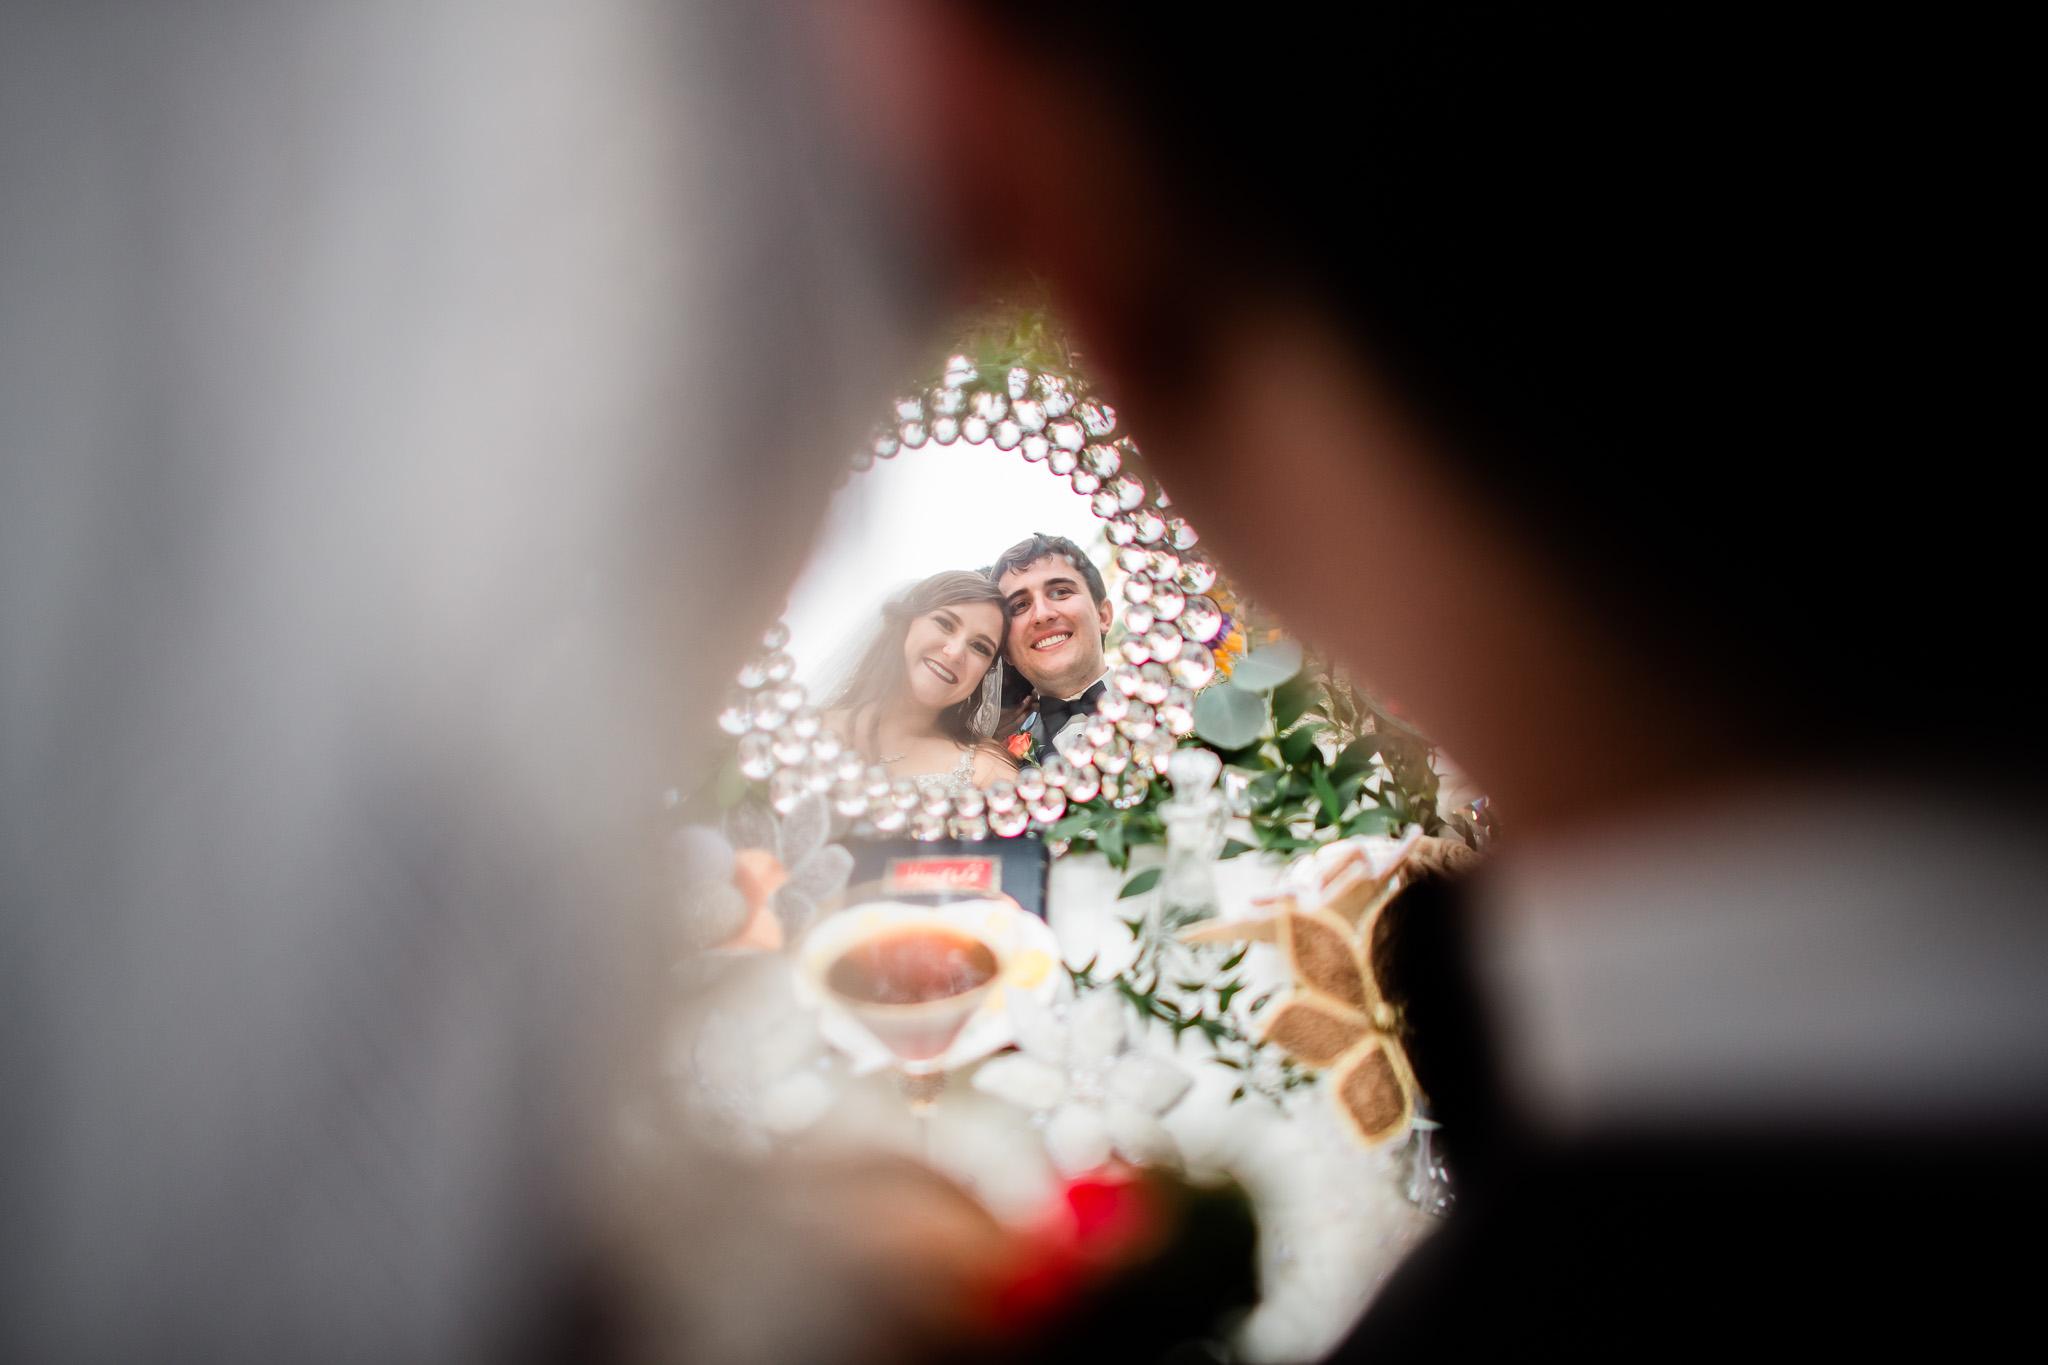 TAMPA_WEDDING_PHOTOGRAPHER_MPMZ_Z85_8622_0112.jpg